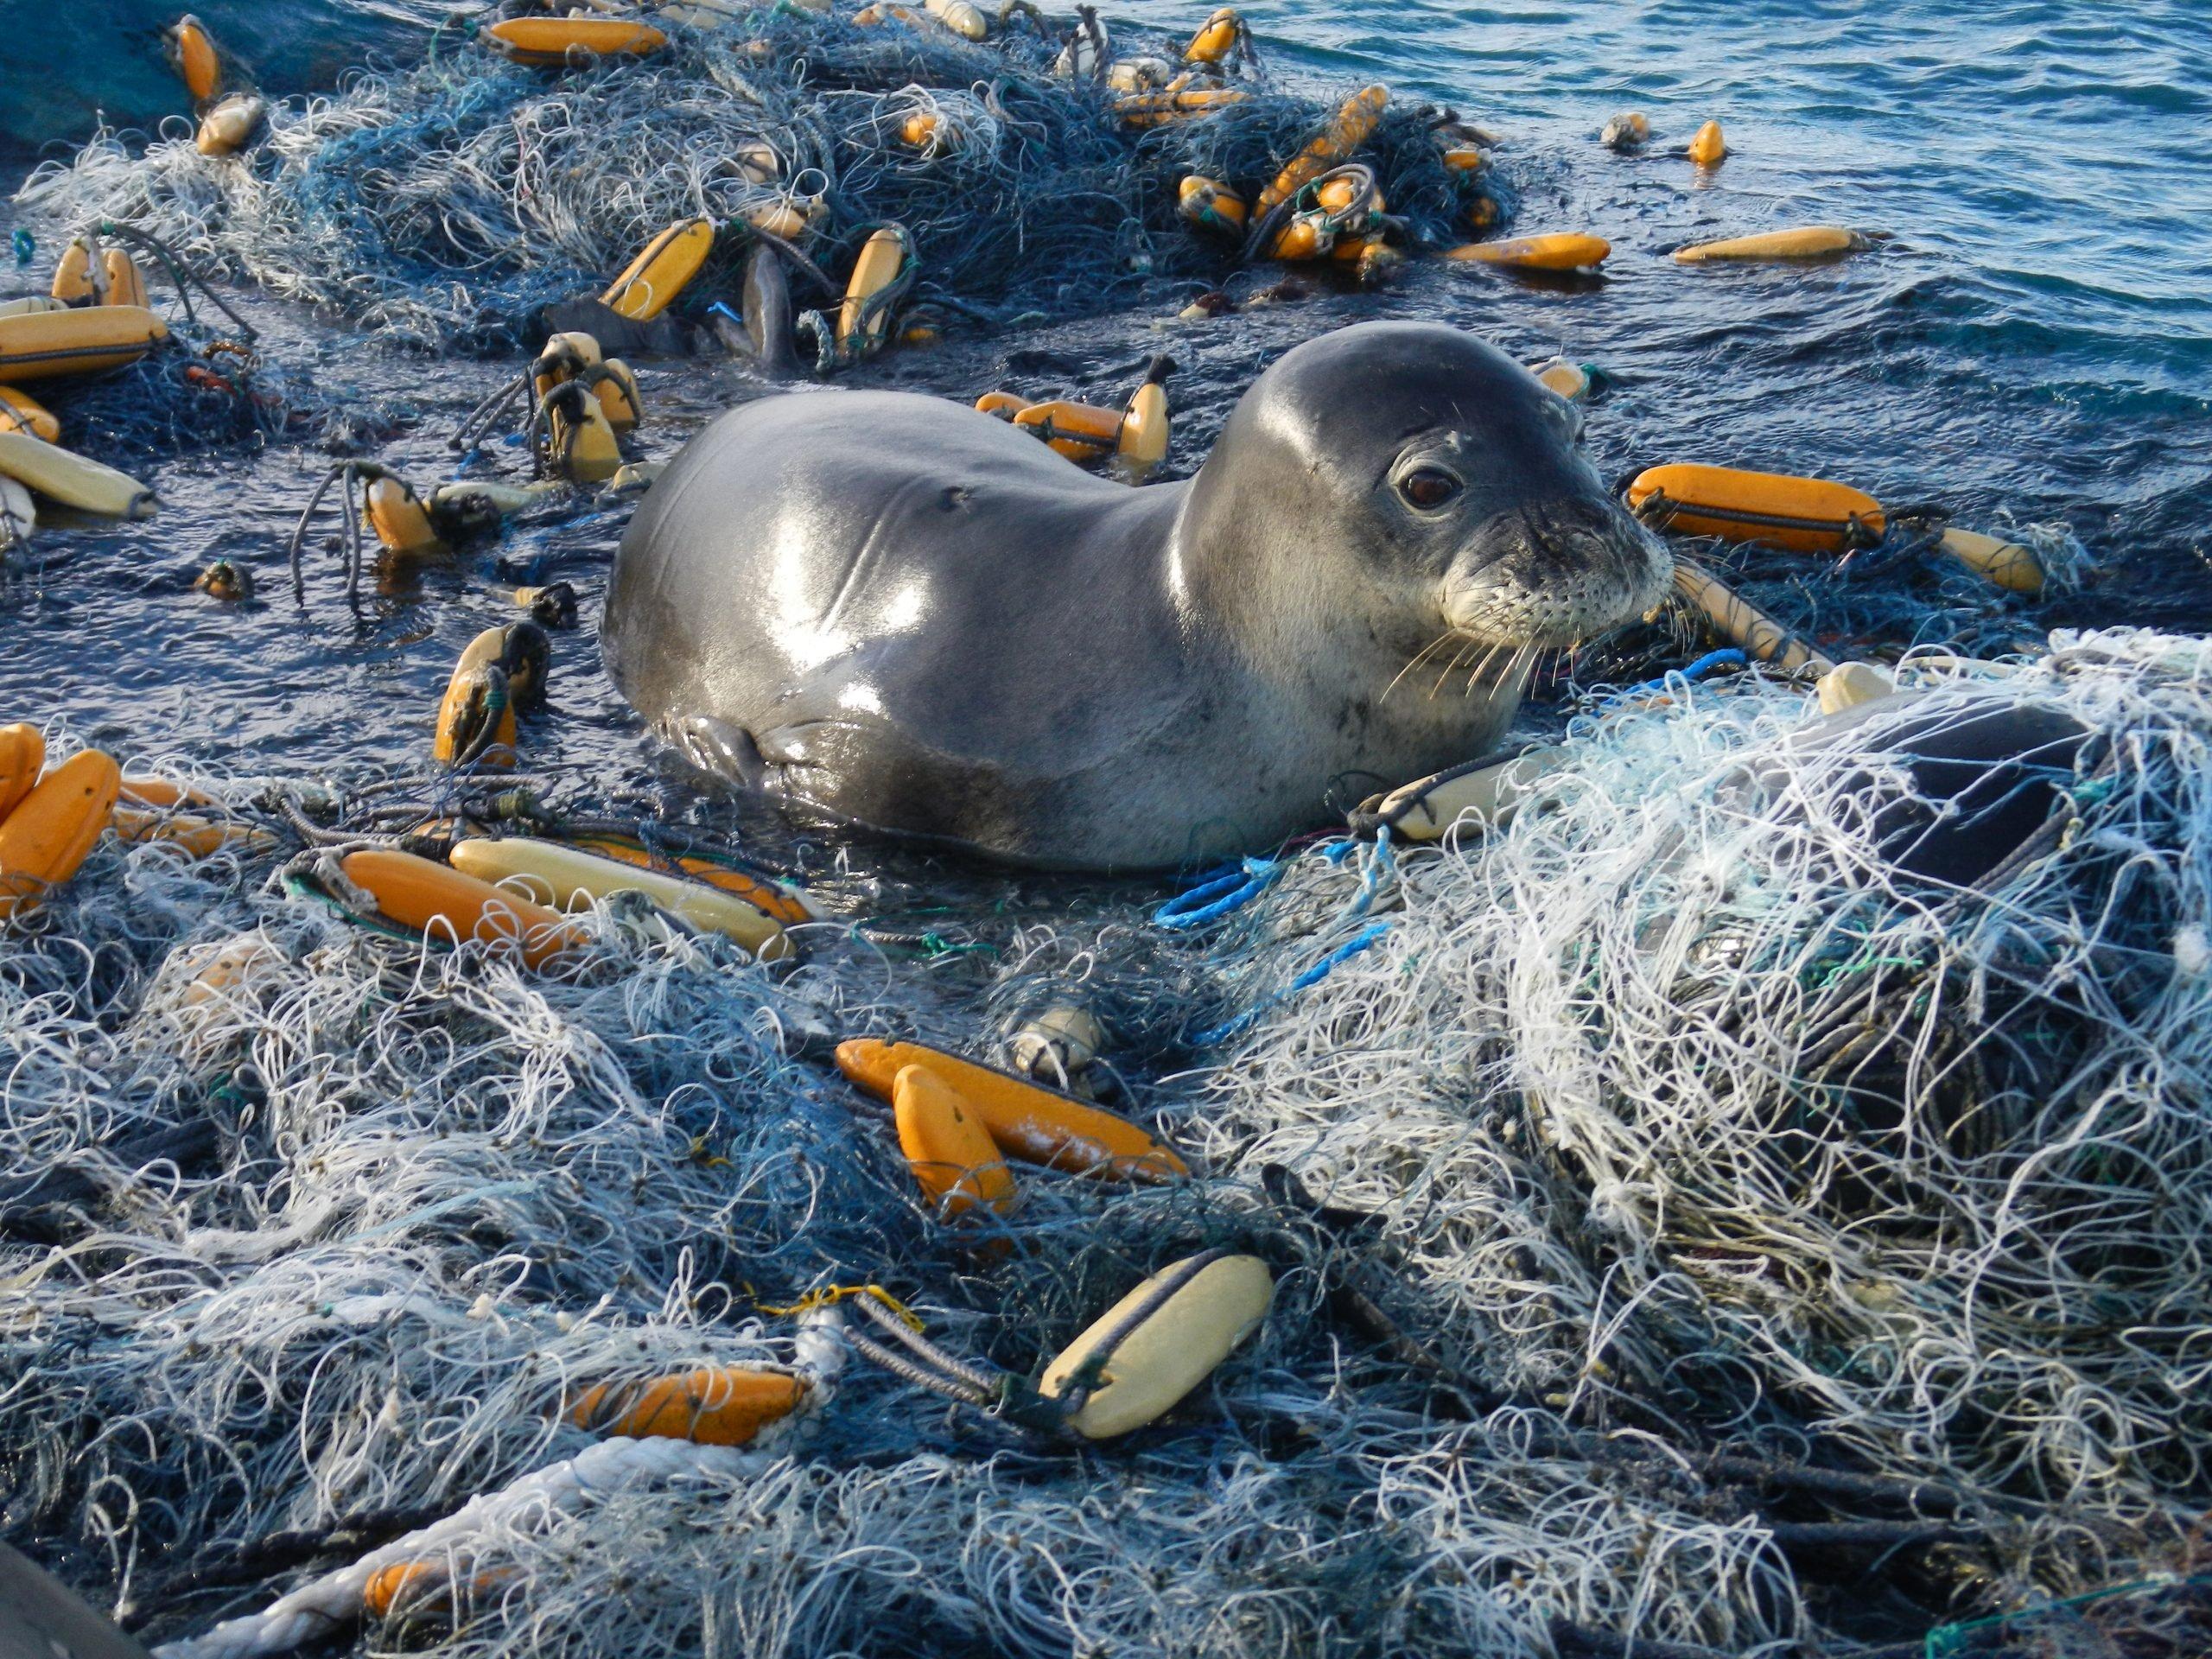 hawaiian monk seal tangled in netting